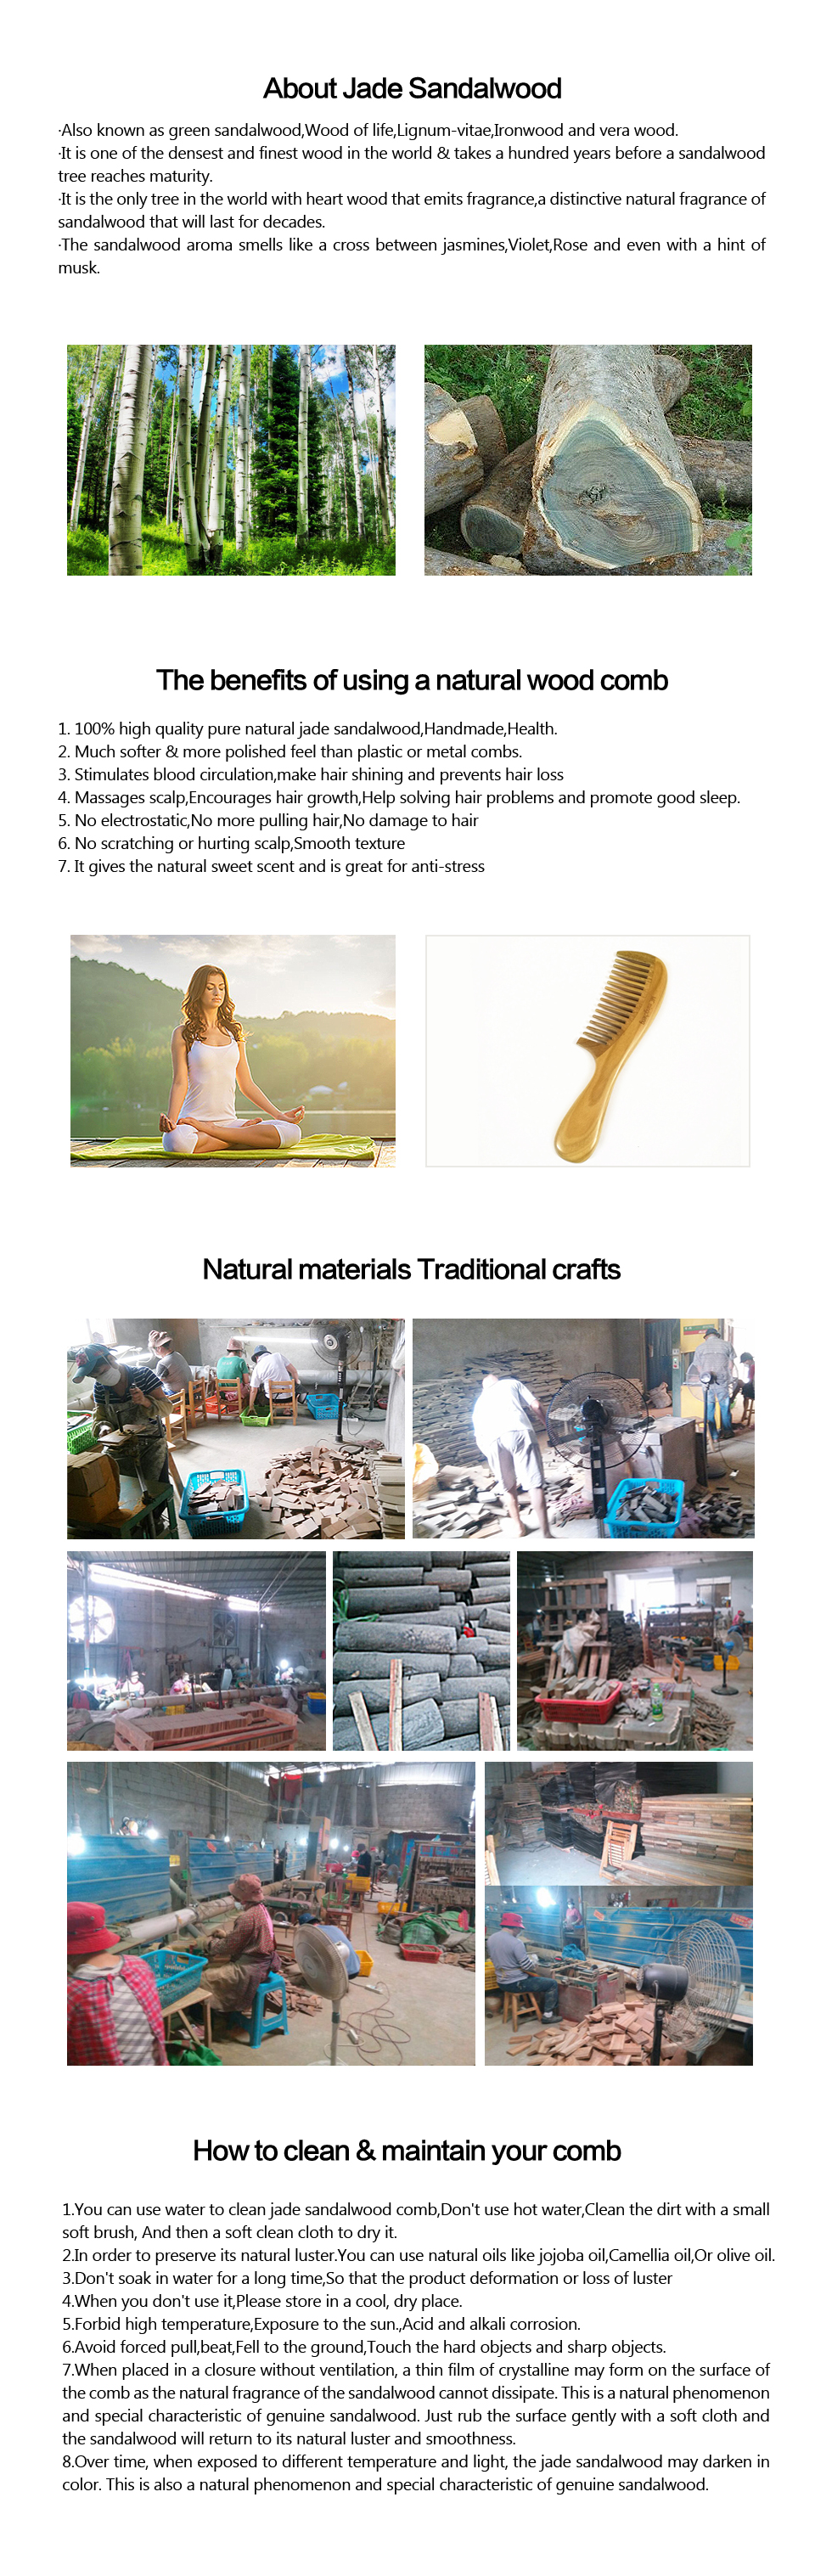 Mc marca artesanal 100% puro natural boi